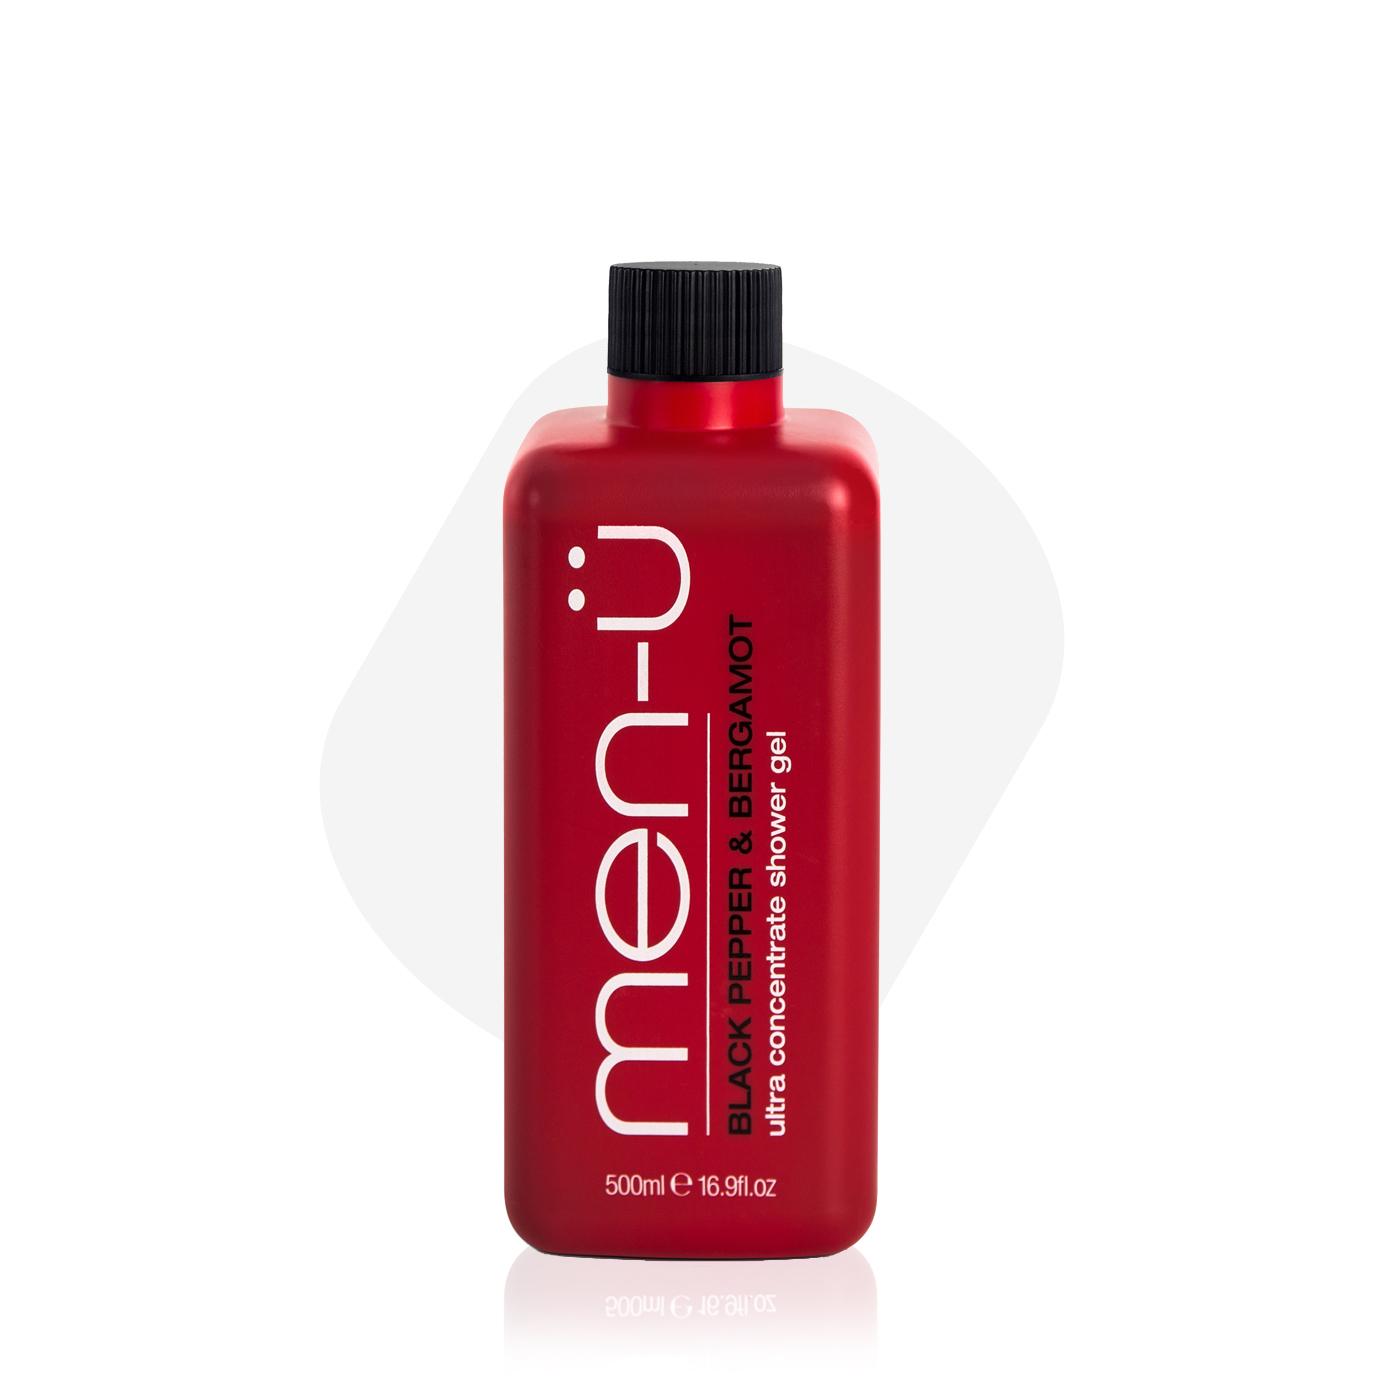 men-u Black Pepper & Bergamot Shower Gel - żel pod prysznic 500 ml (1)